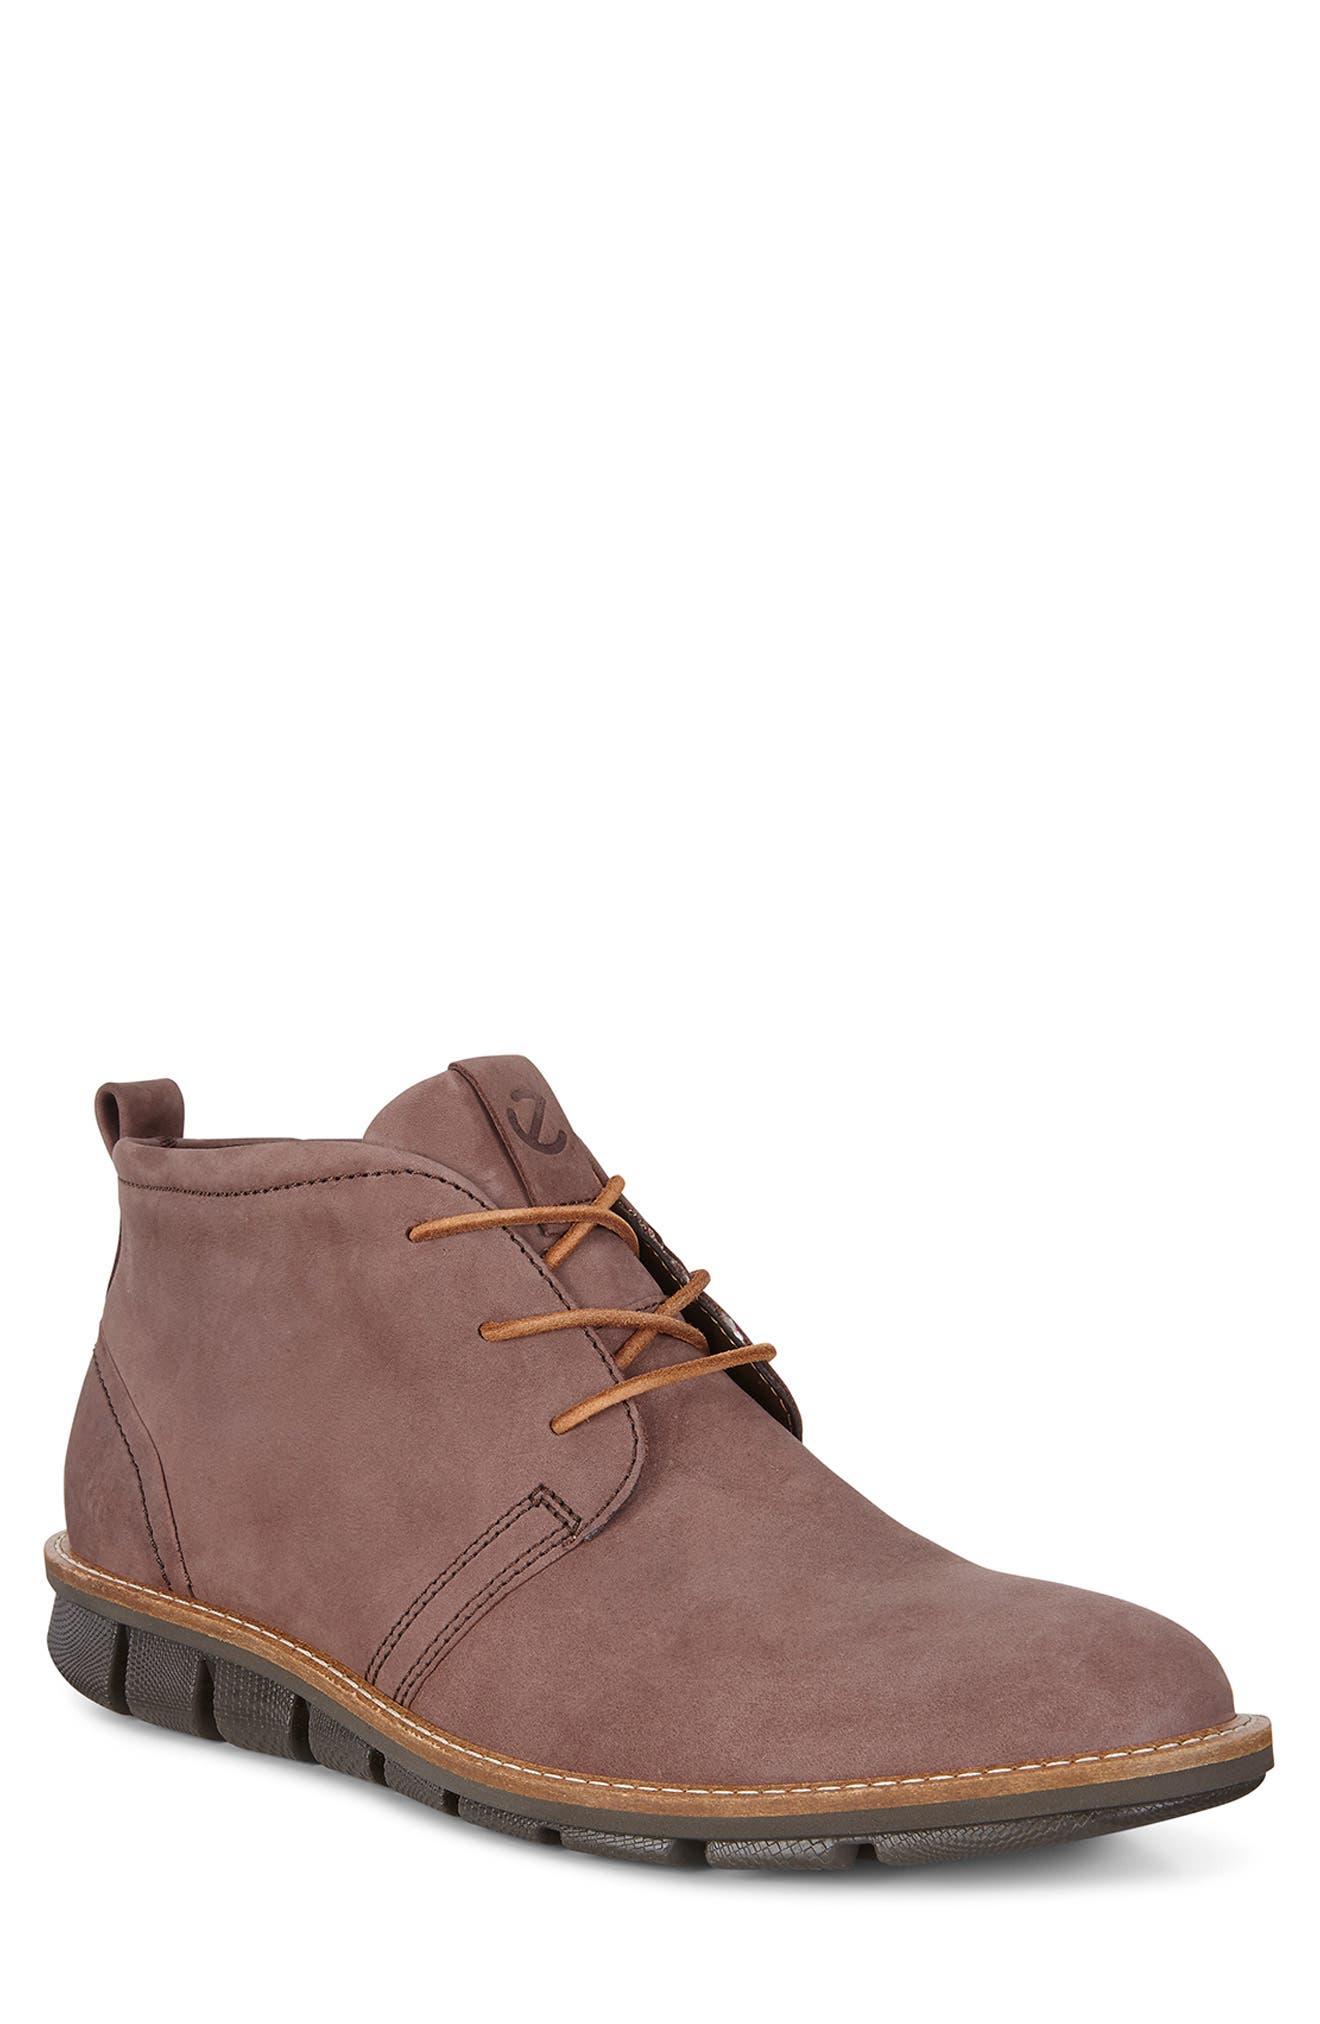 'Jeremy Hybrid' Plain Toe Boot,                         Main,                         color, COFFEE LEATHER